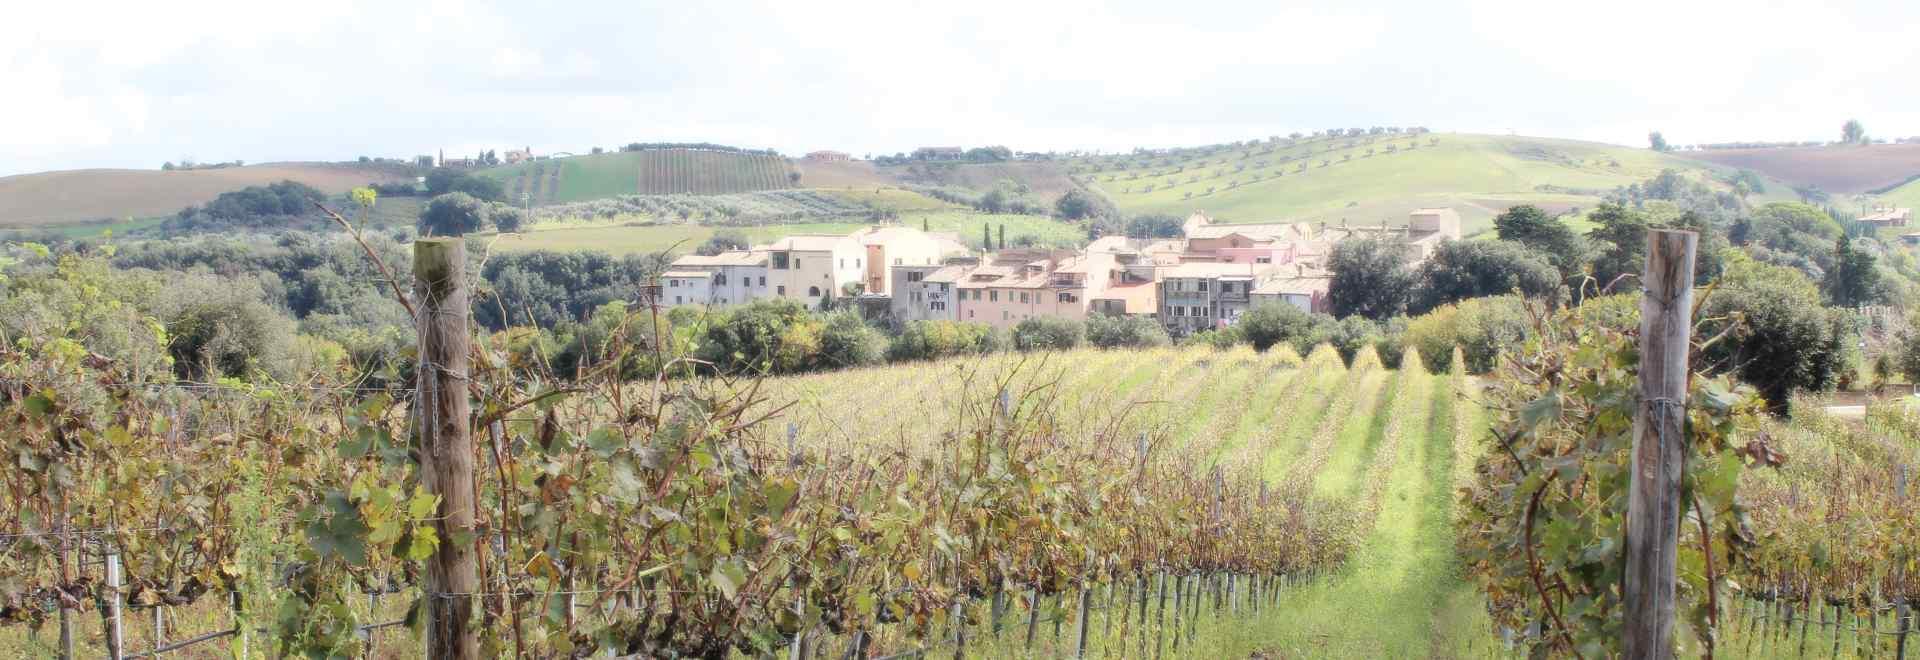 Cantina ed azienda vitivinicola